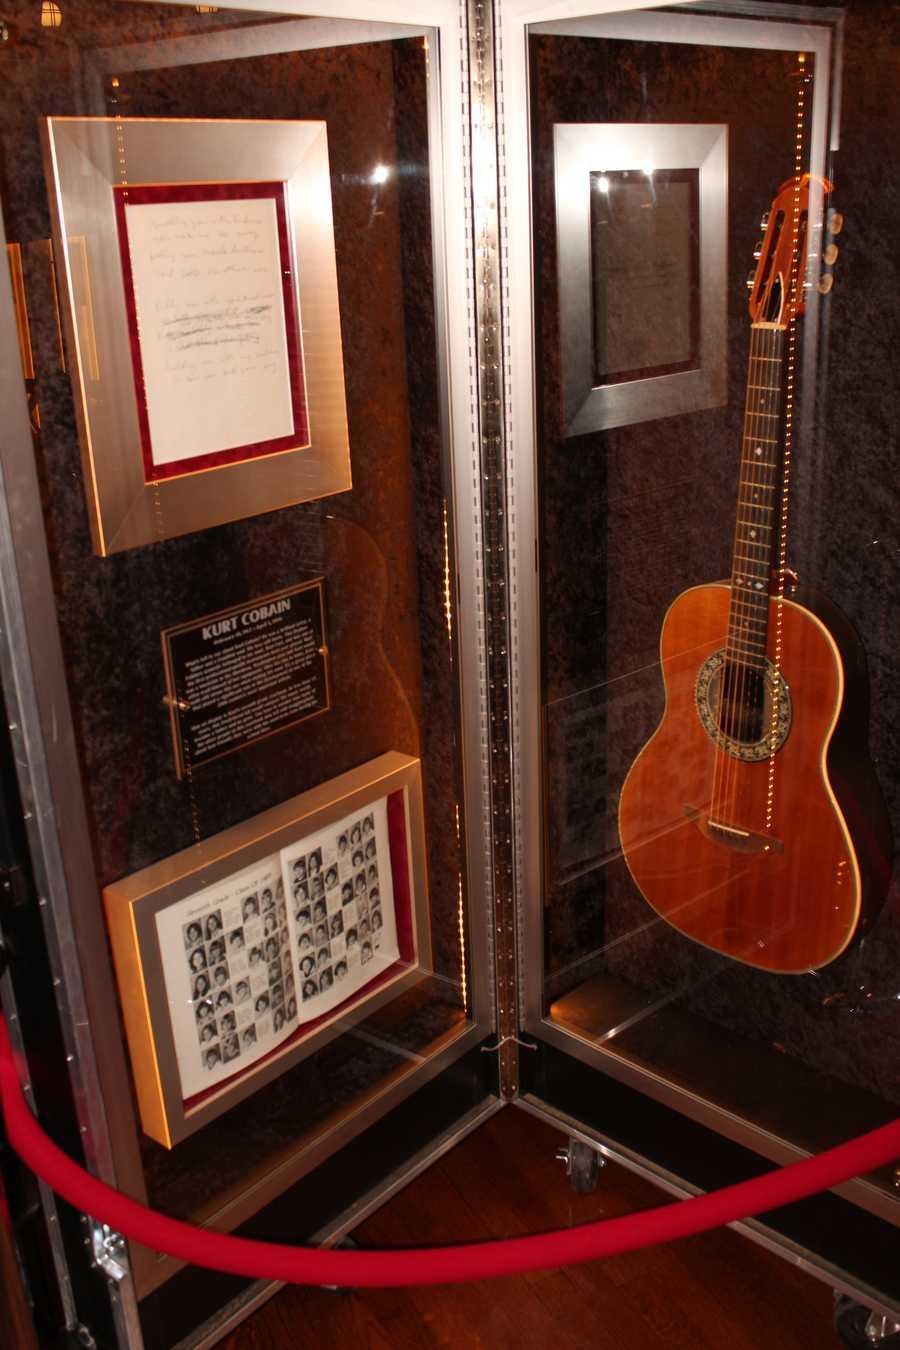 Kurt Cobain's Ovation acoustic.